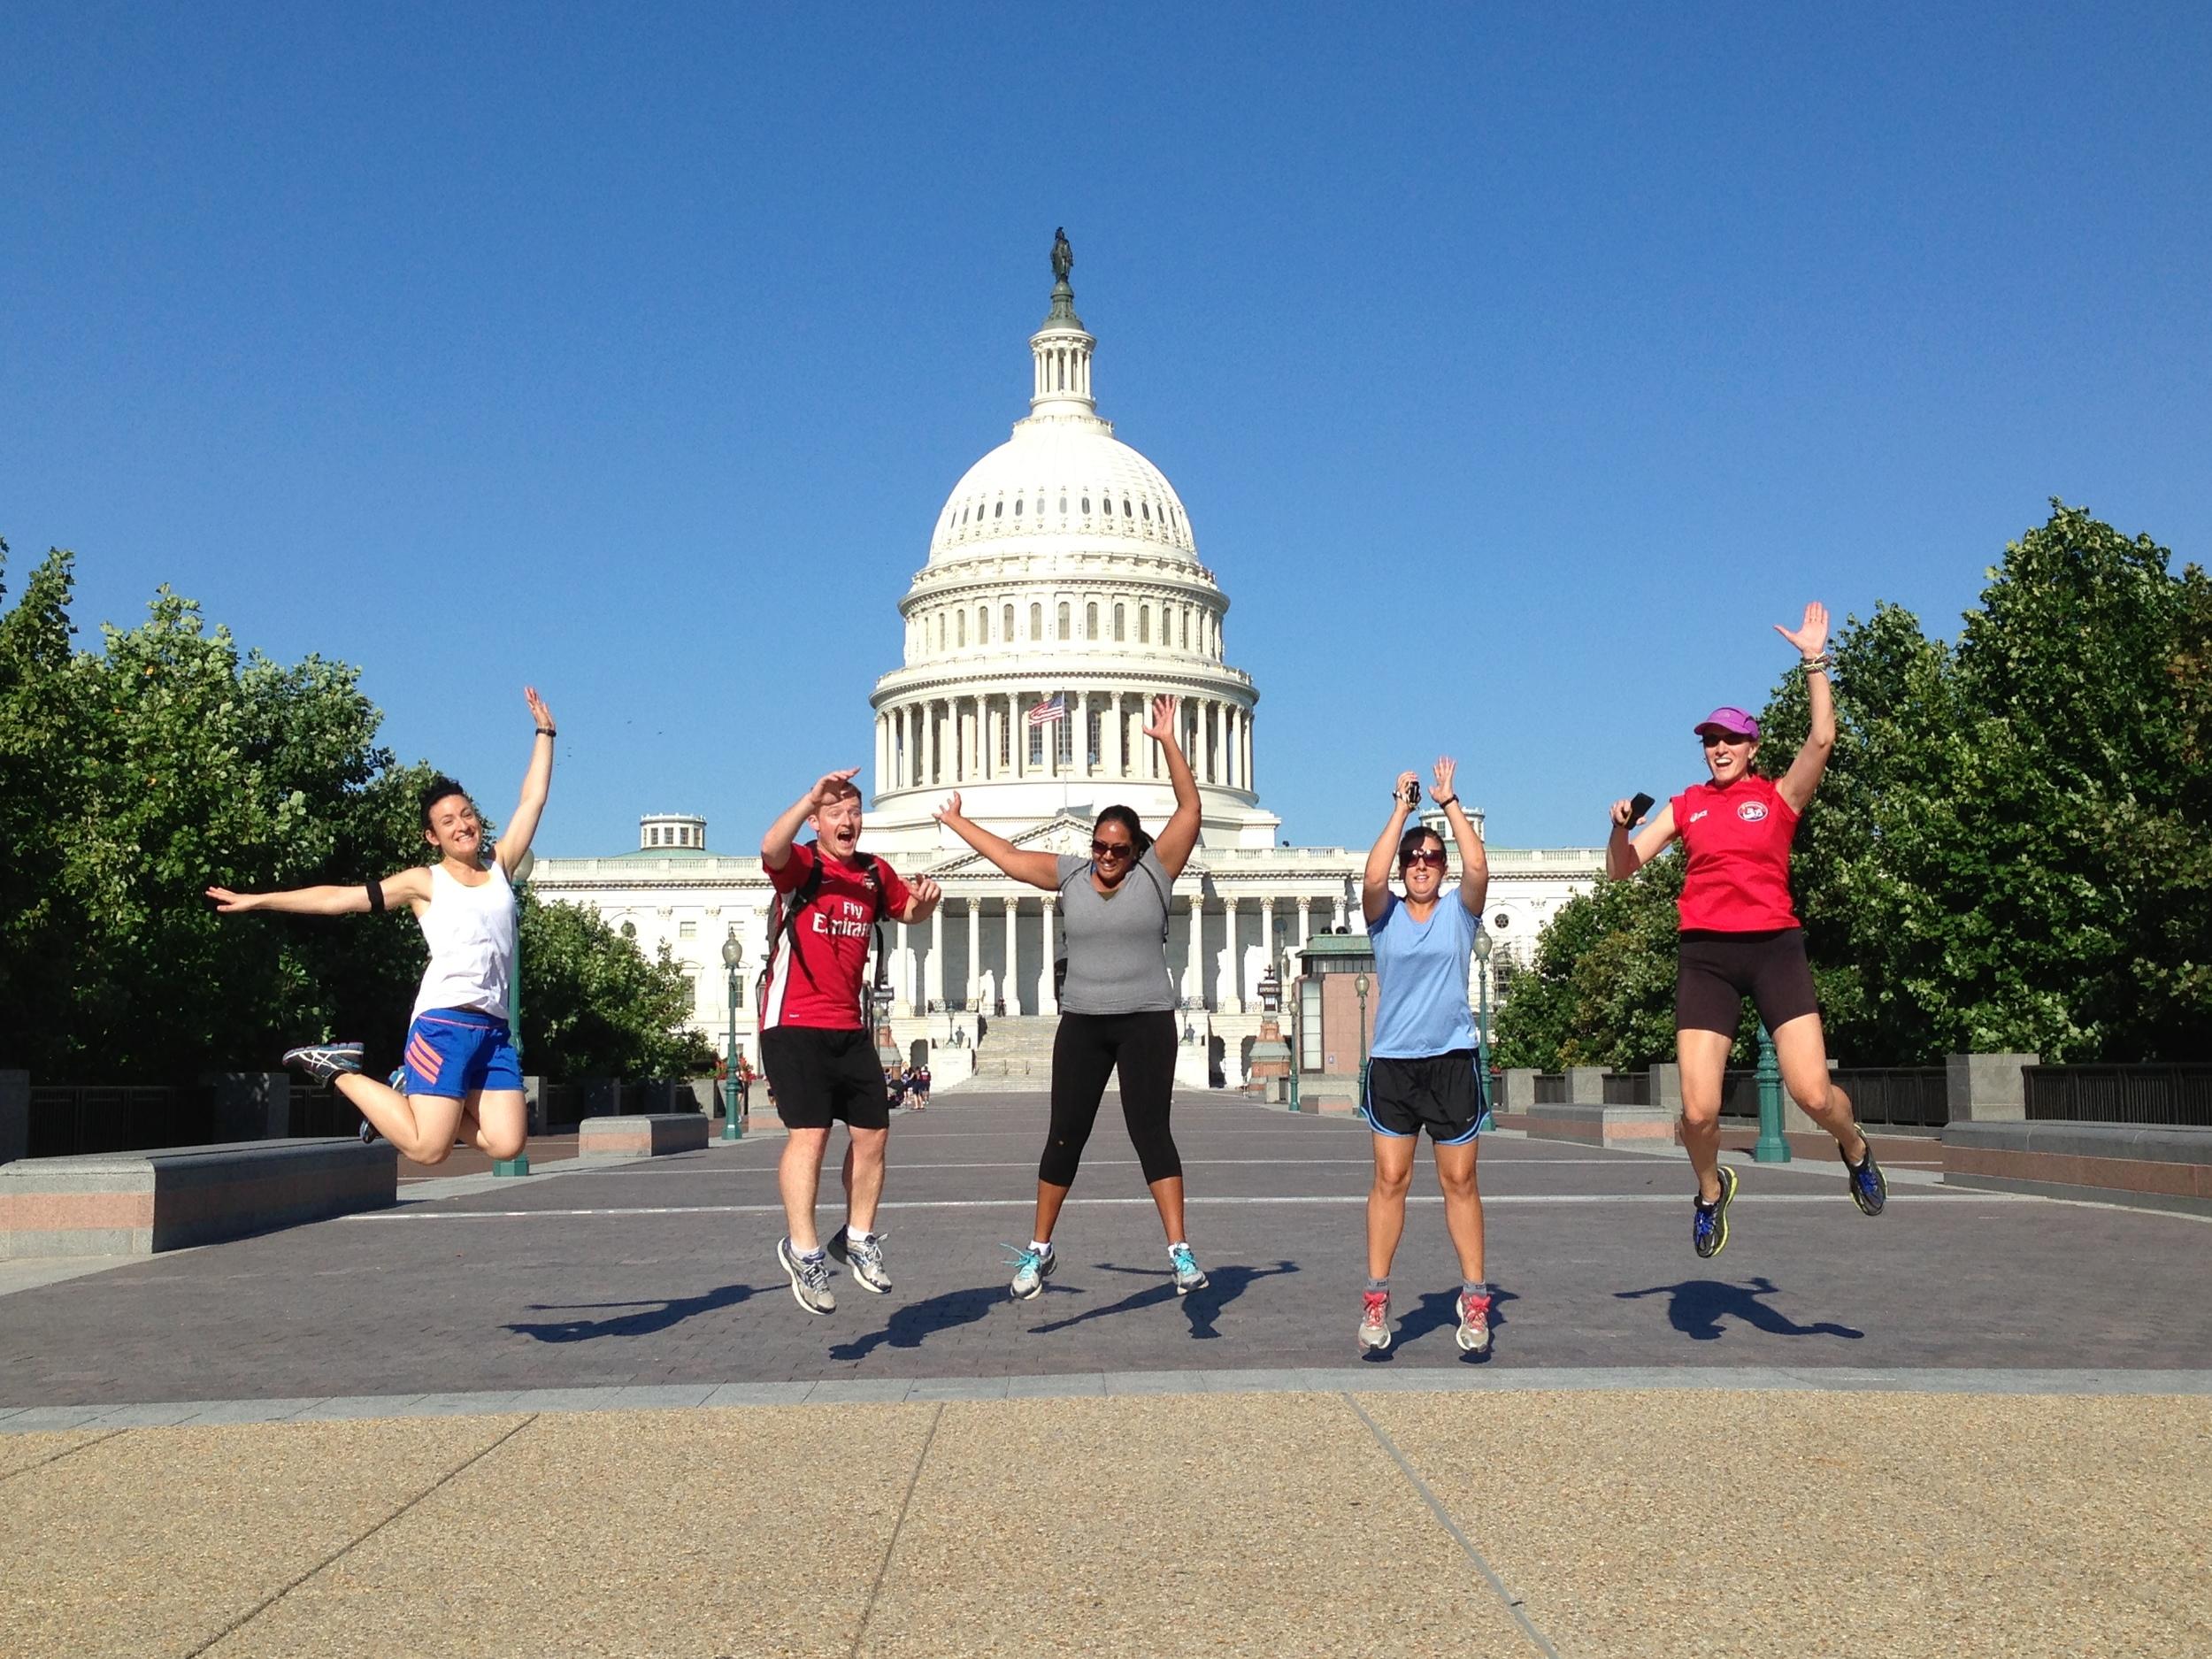 Washington Dc Tours >> City Running Tours Washington Dc